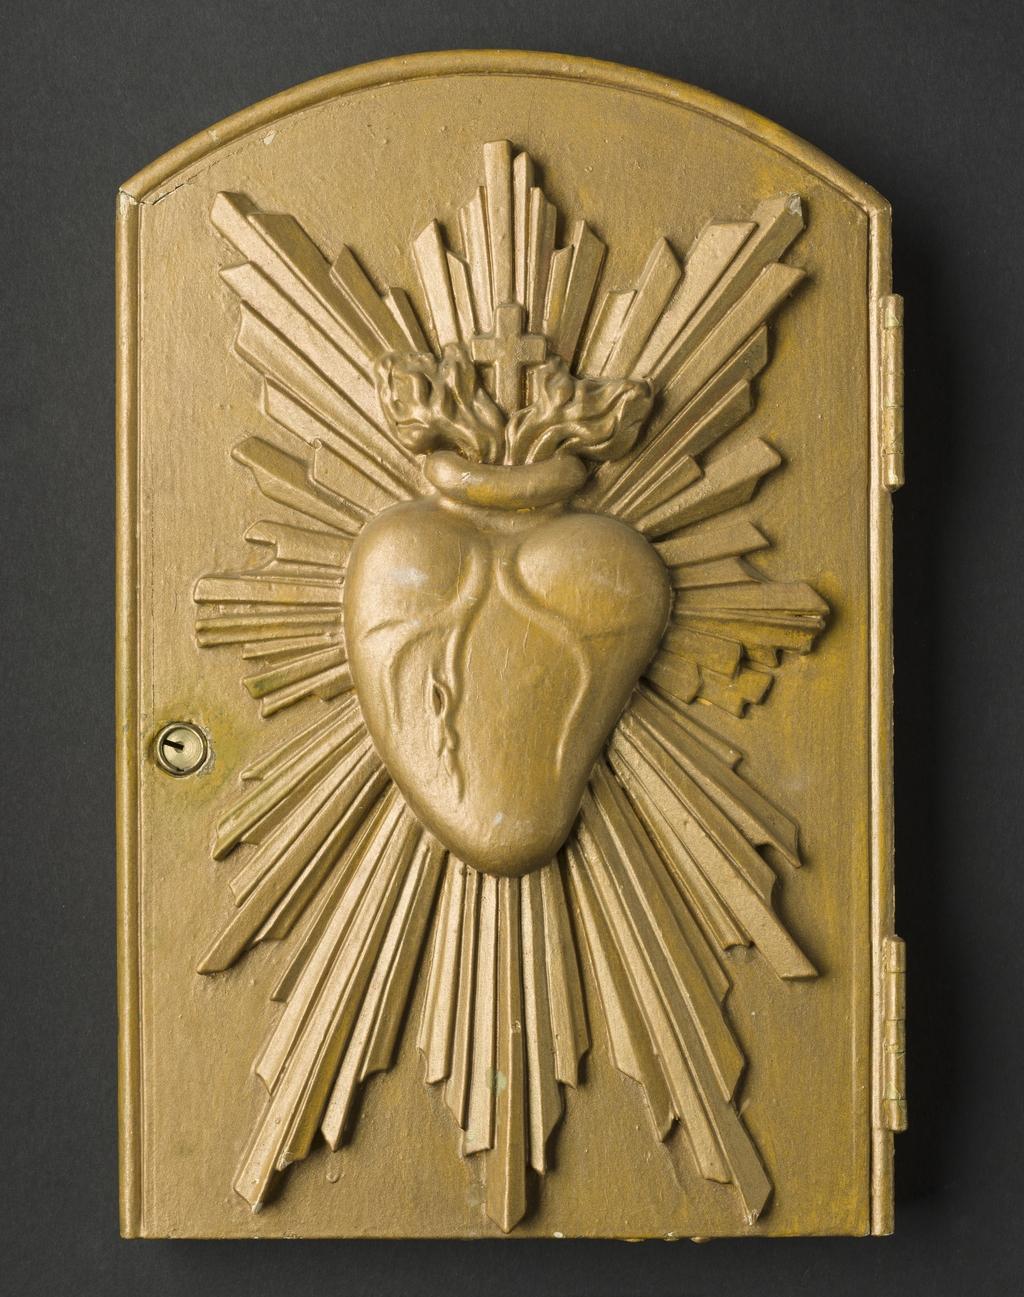 Porte de tabernacle ornée d'un coeur